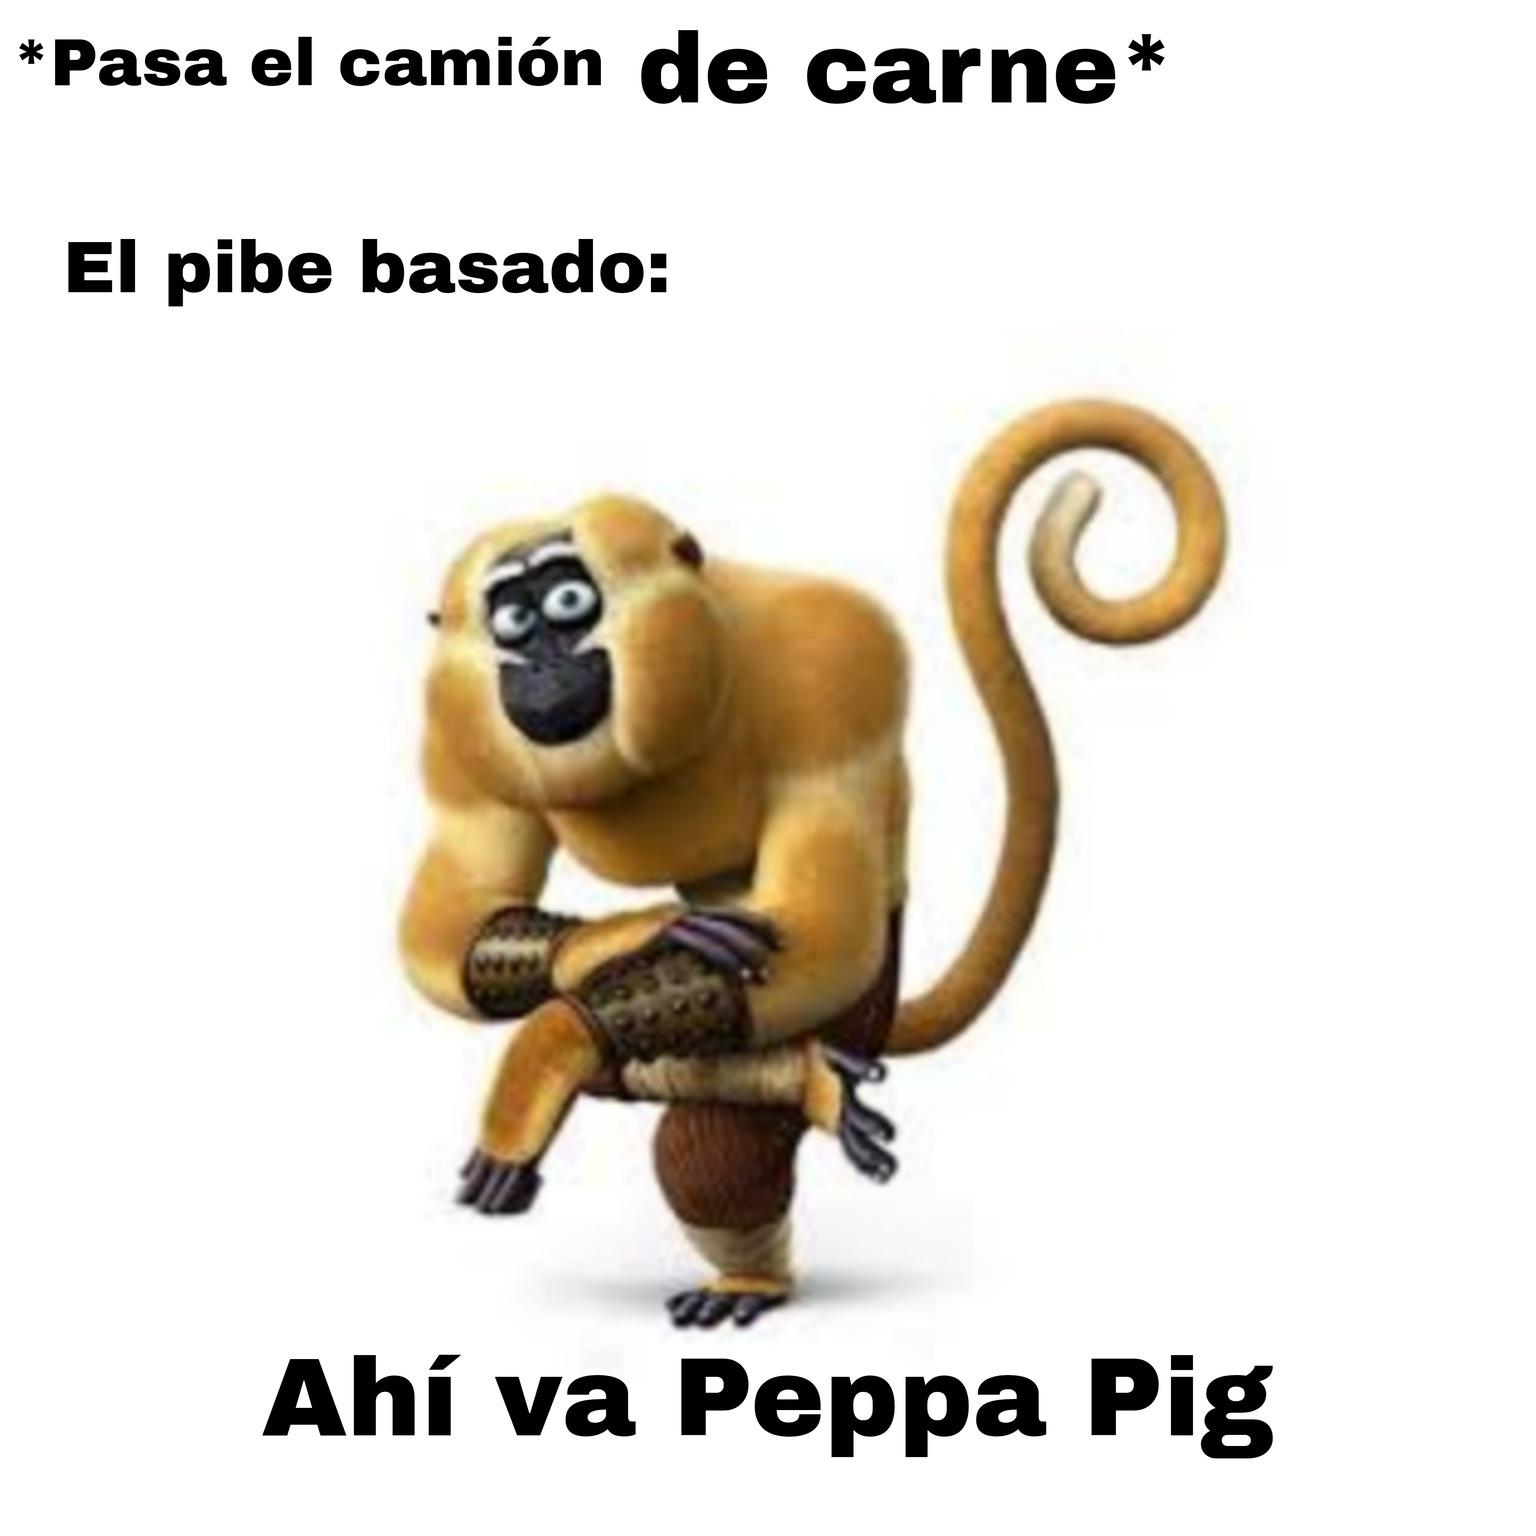 Ahí va Peppa Pig y su familia - meme